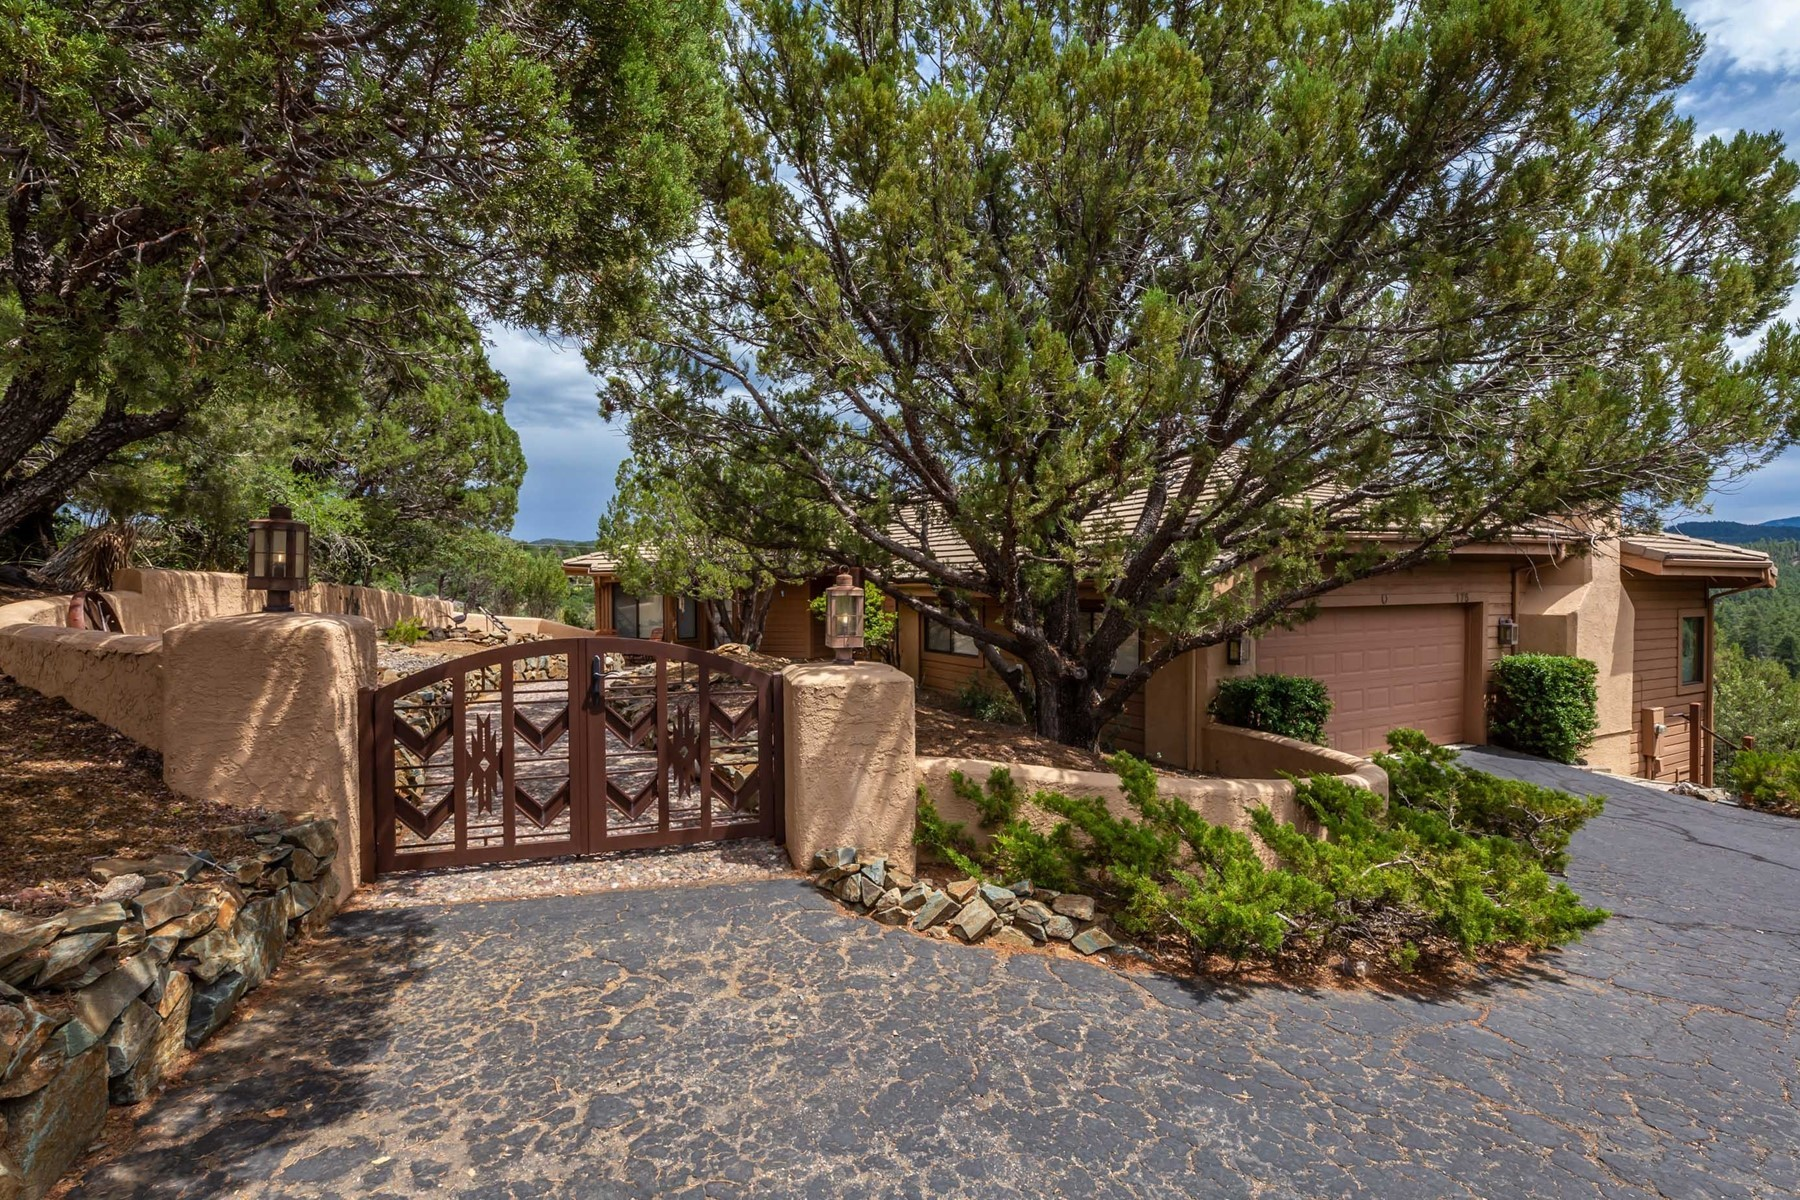 Single Family Homes por un Venta en Meticulously Cared for Prescott Home 175 Crestwood E Prescott, Arizona 86303 Estados Unidos